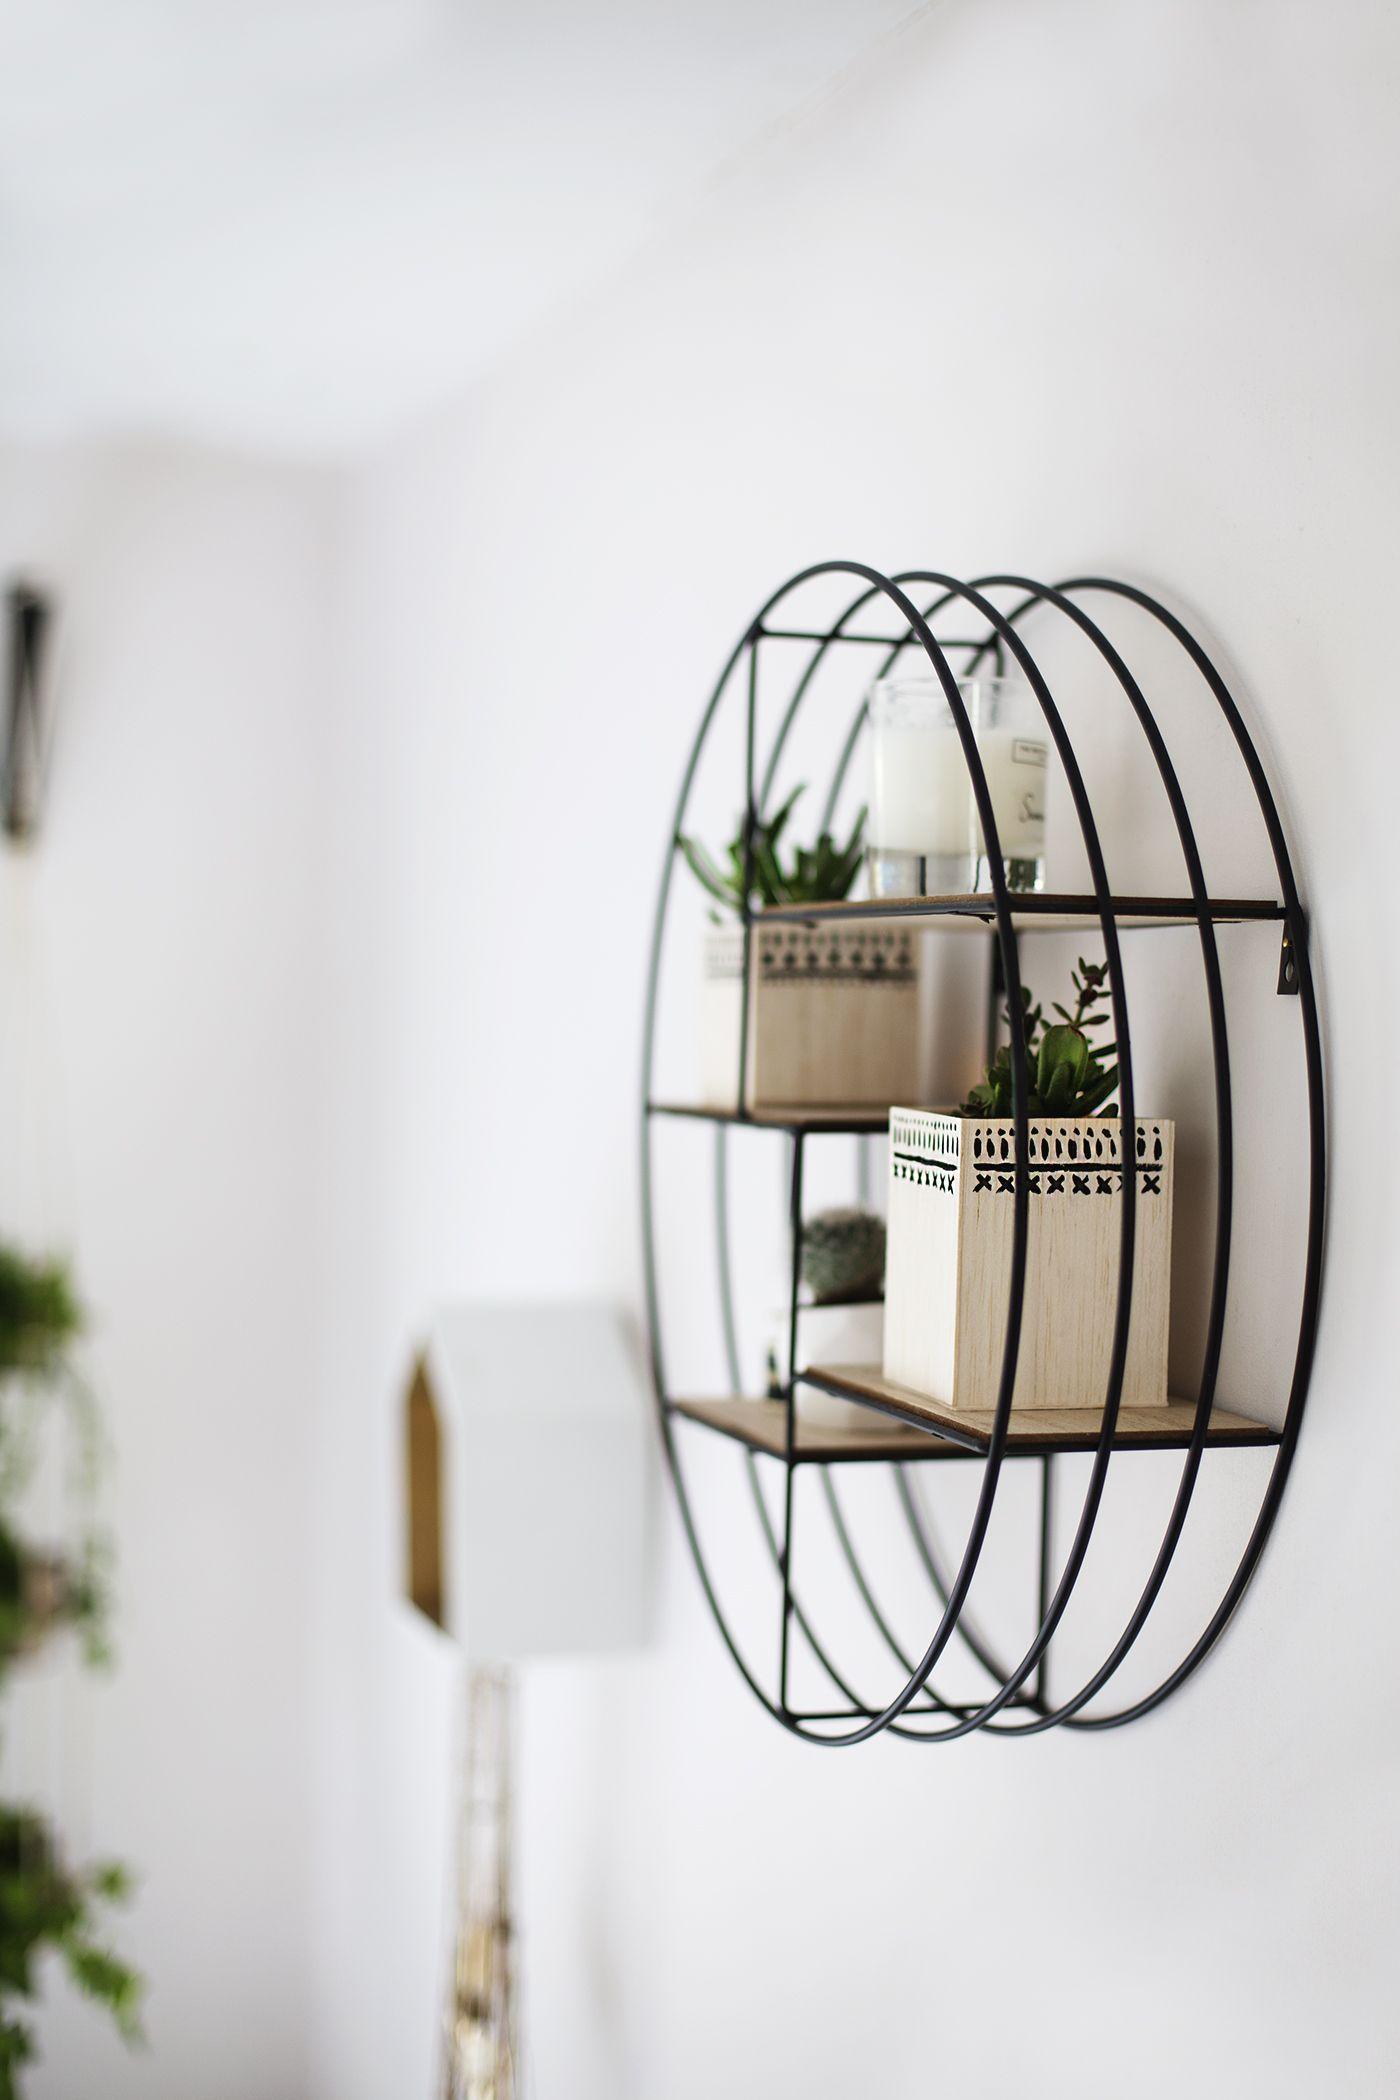 DIY decorative wood planters | easy home craft ideas | home decor ...